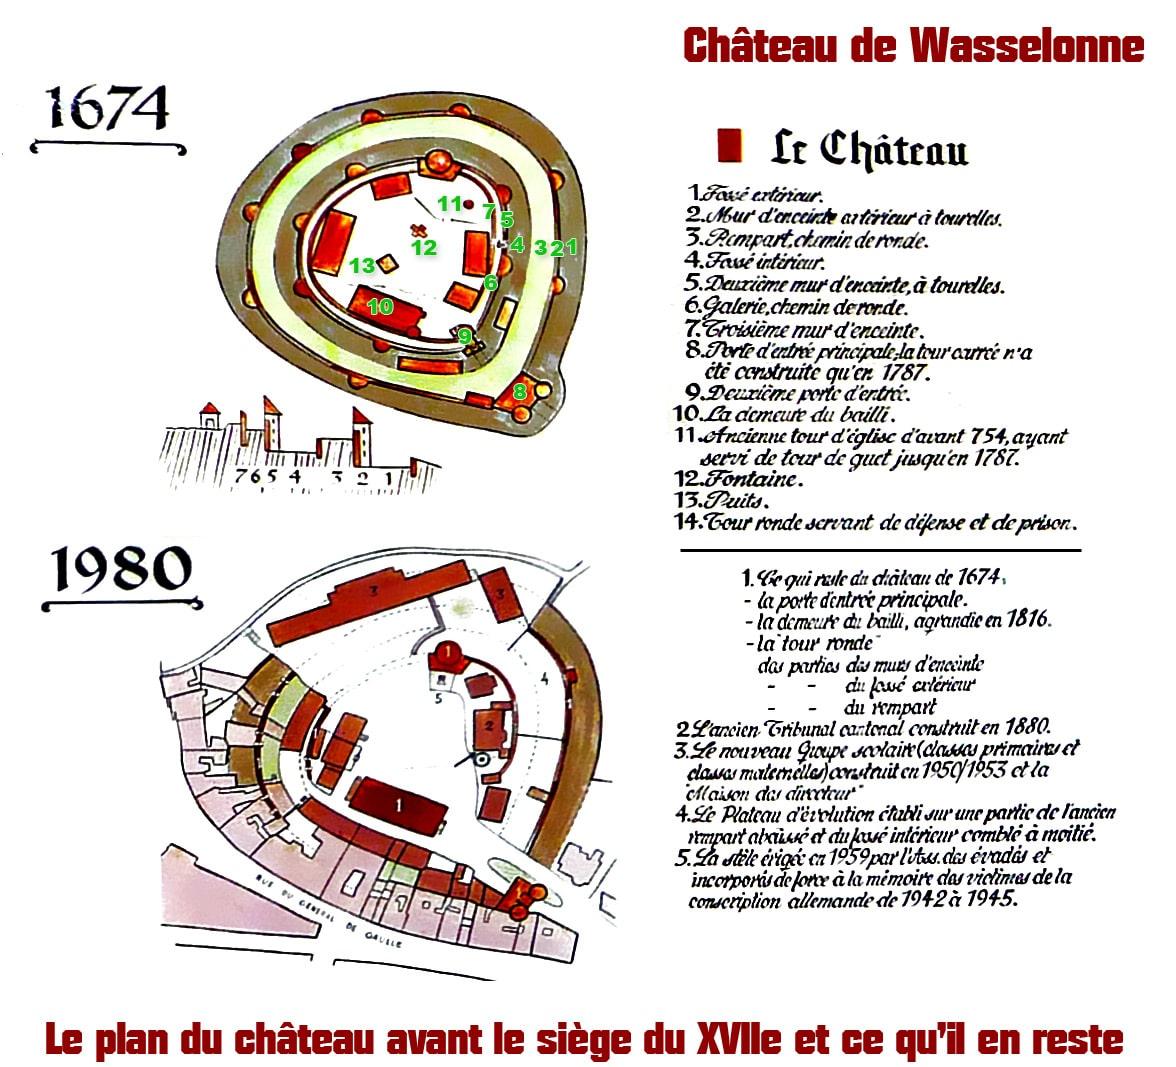 wasselonne_histoire_medievale_ville_vestige_chateau-fort_forteresse_moyen-age_tardif